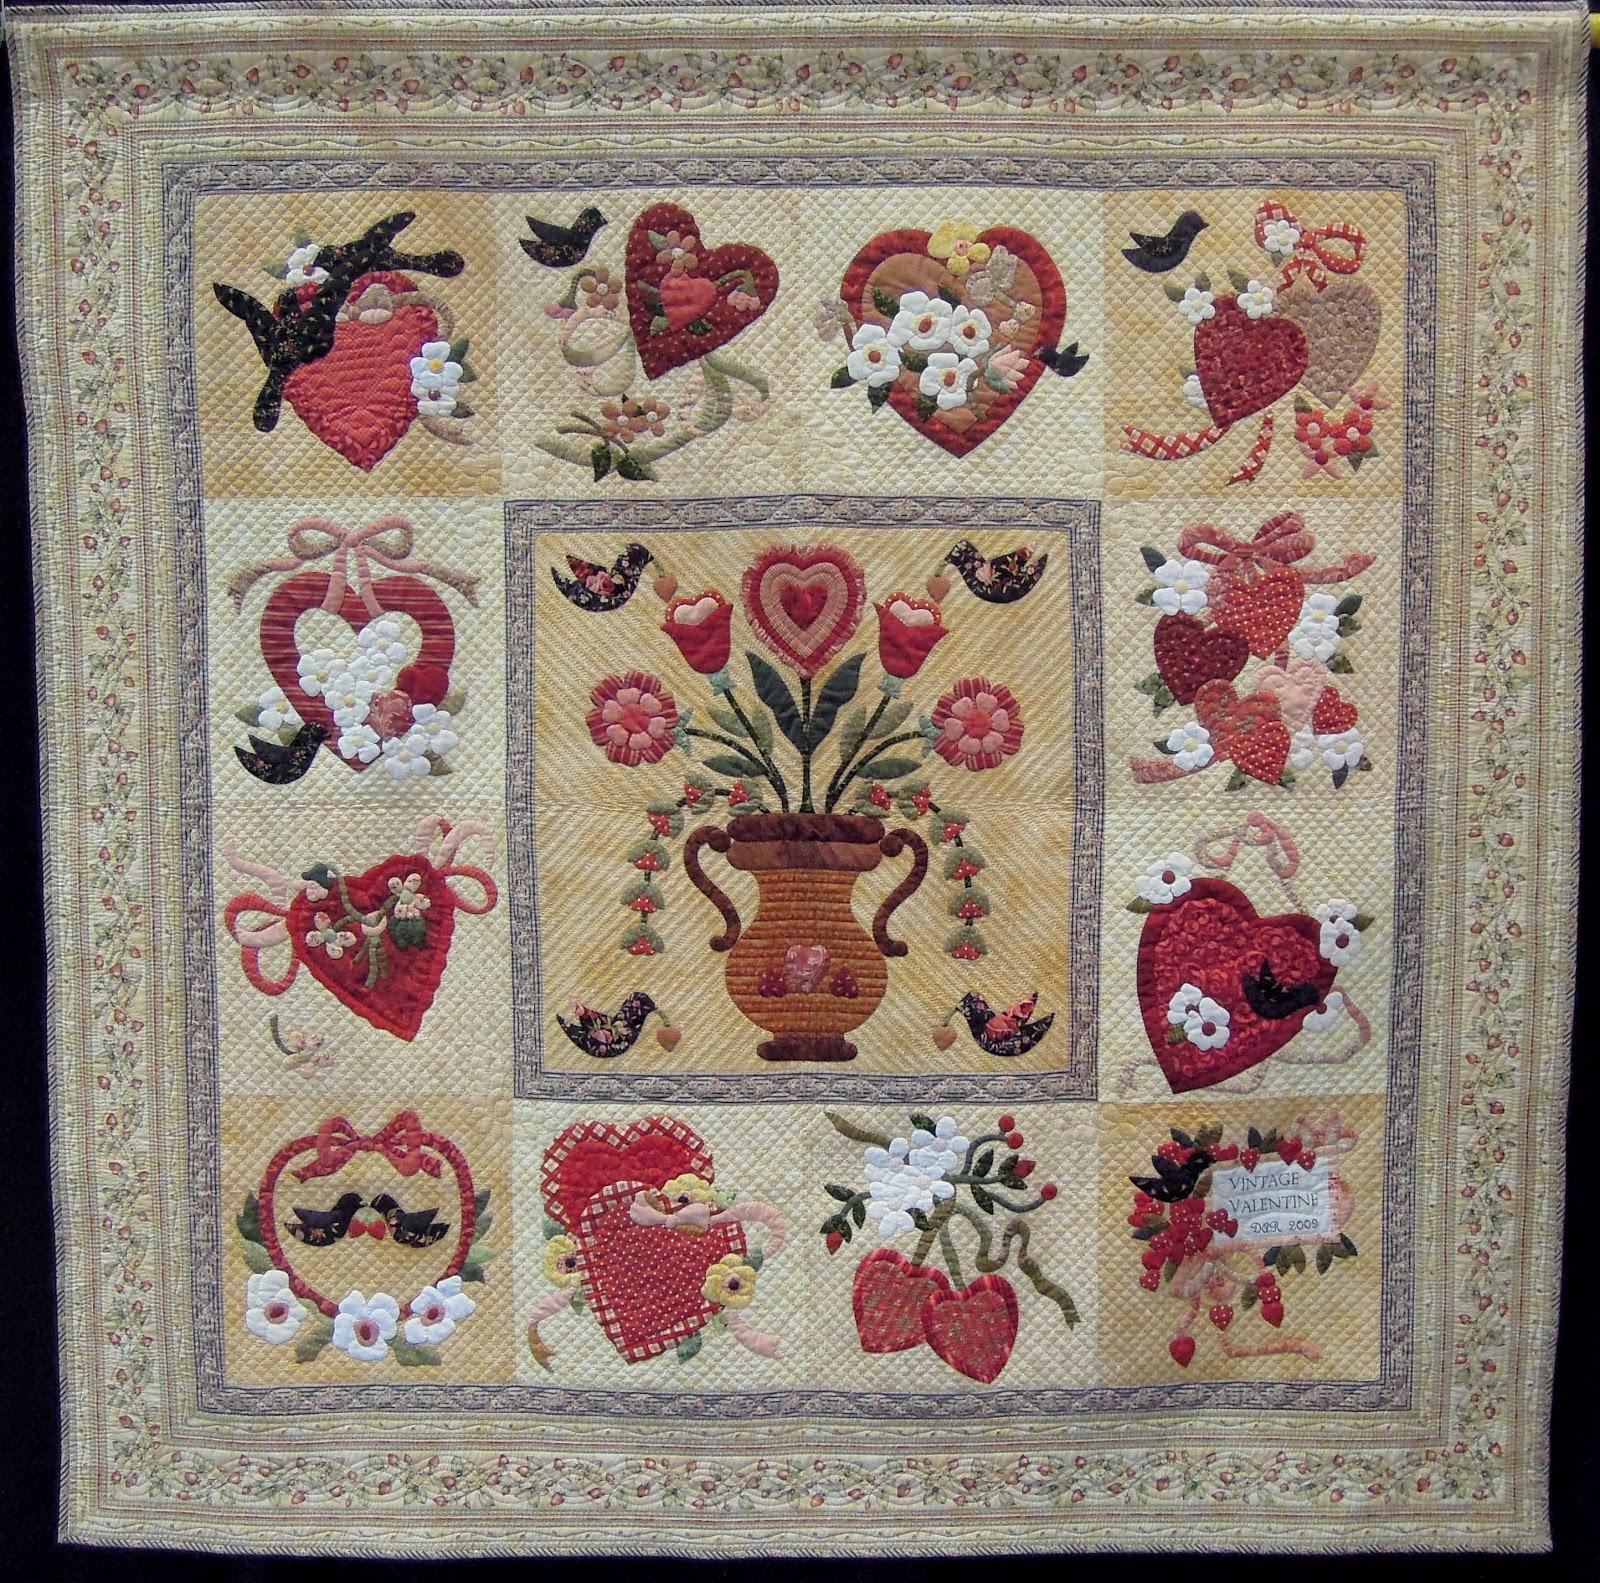 Quilt Inspiration Vintage And Modern Valentines Part 1